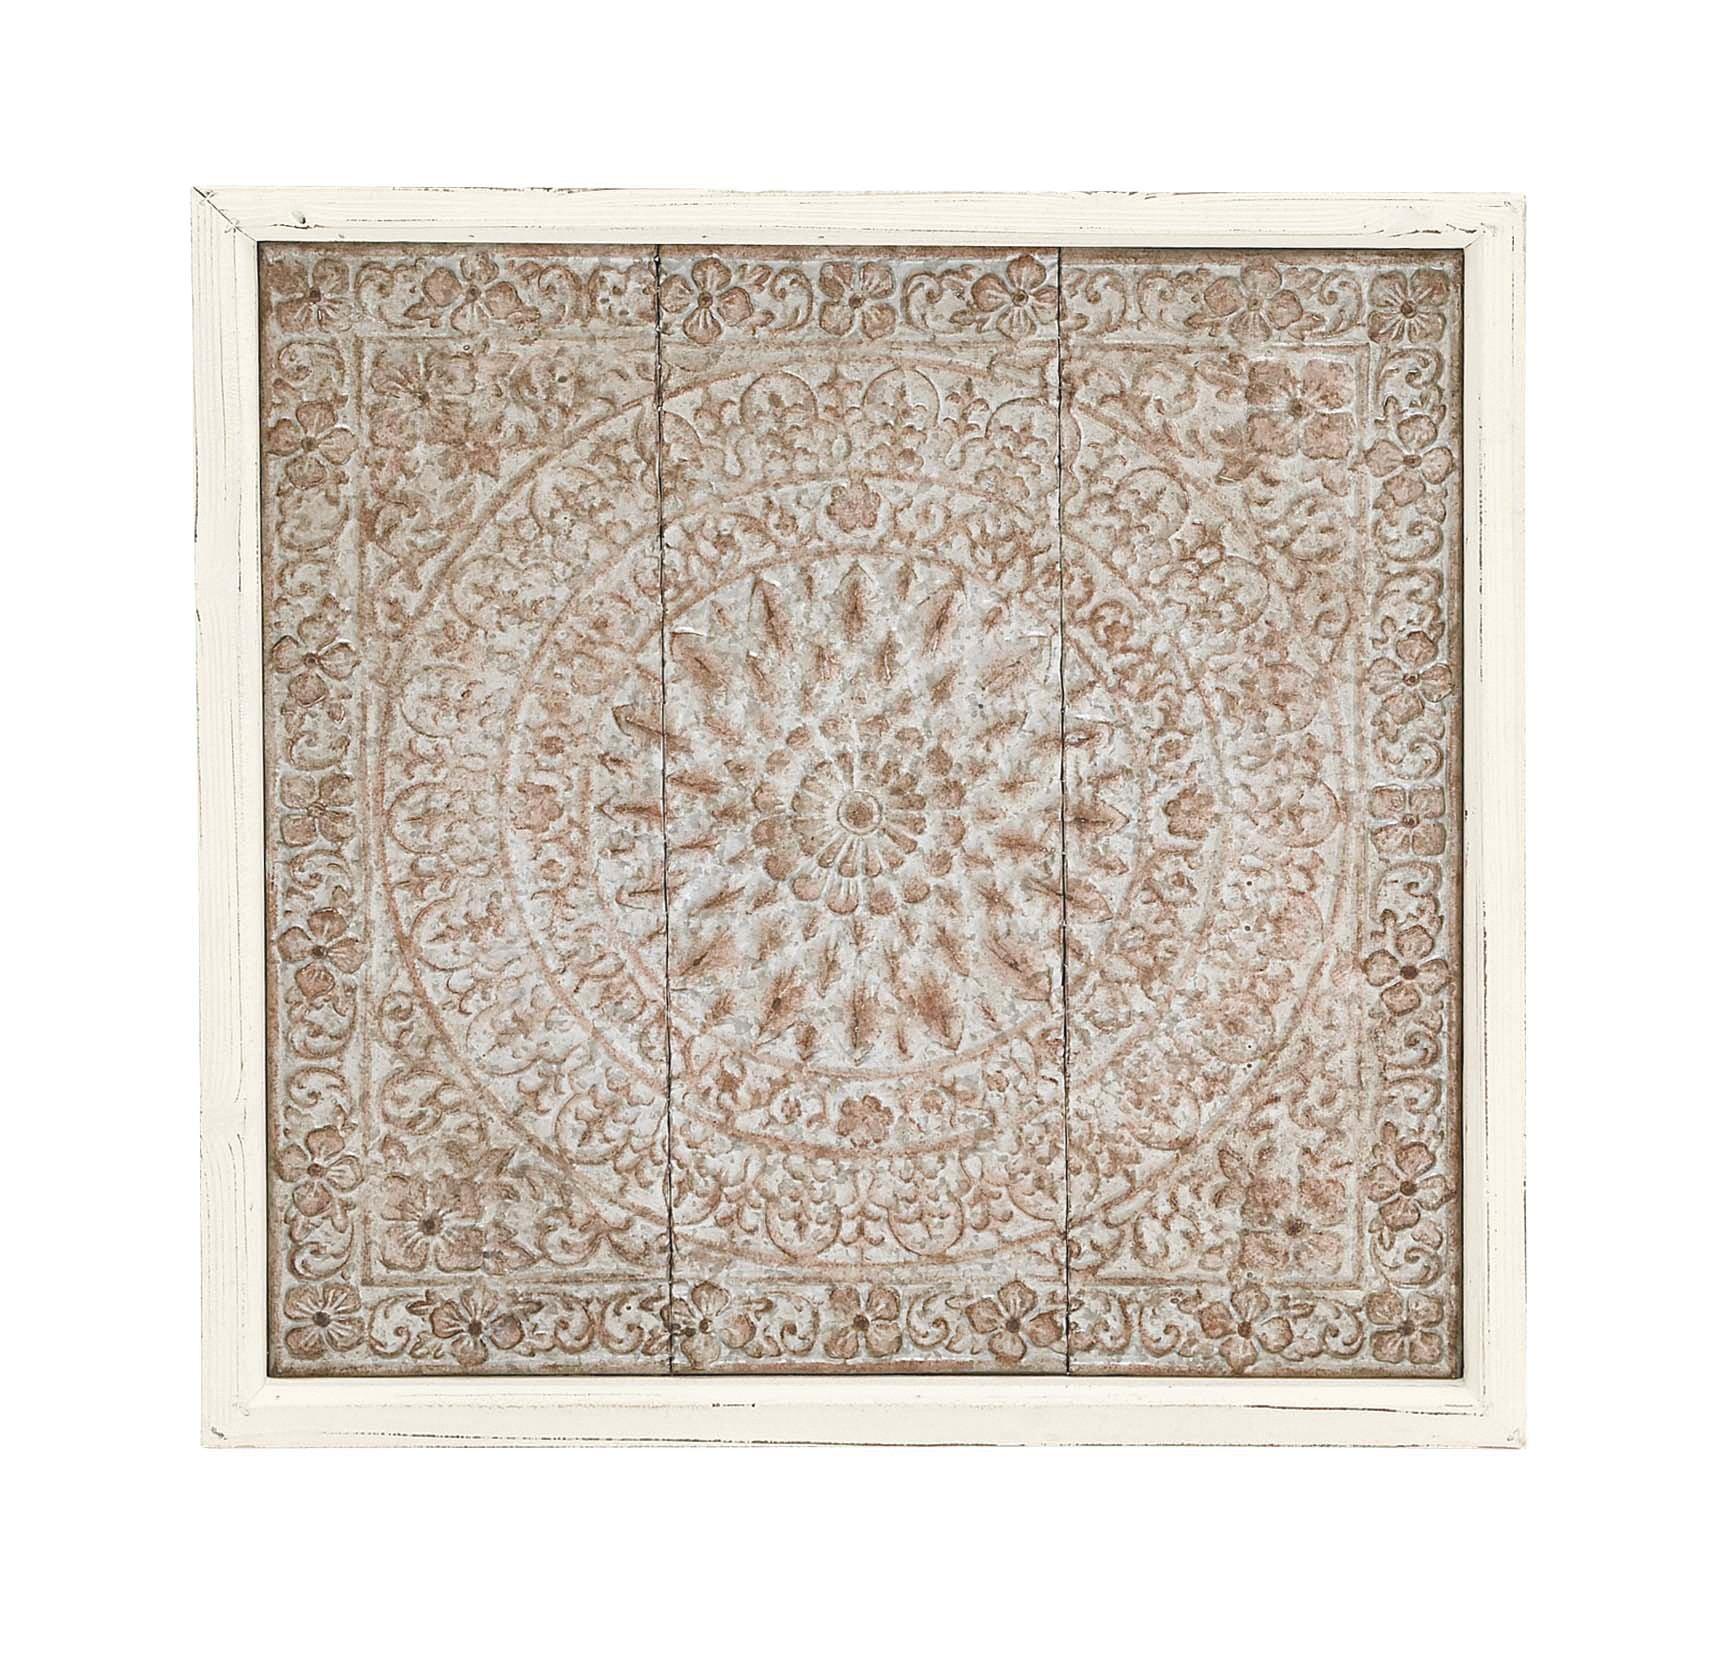 Deco 79 55533 Wood/Metal Wall Plaque, 34'' x 34''